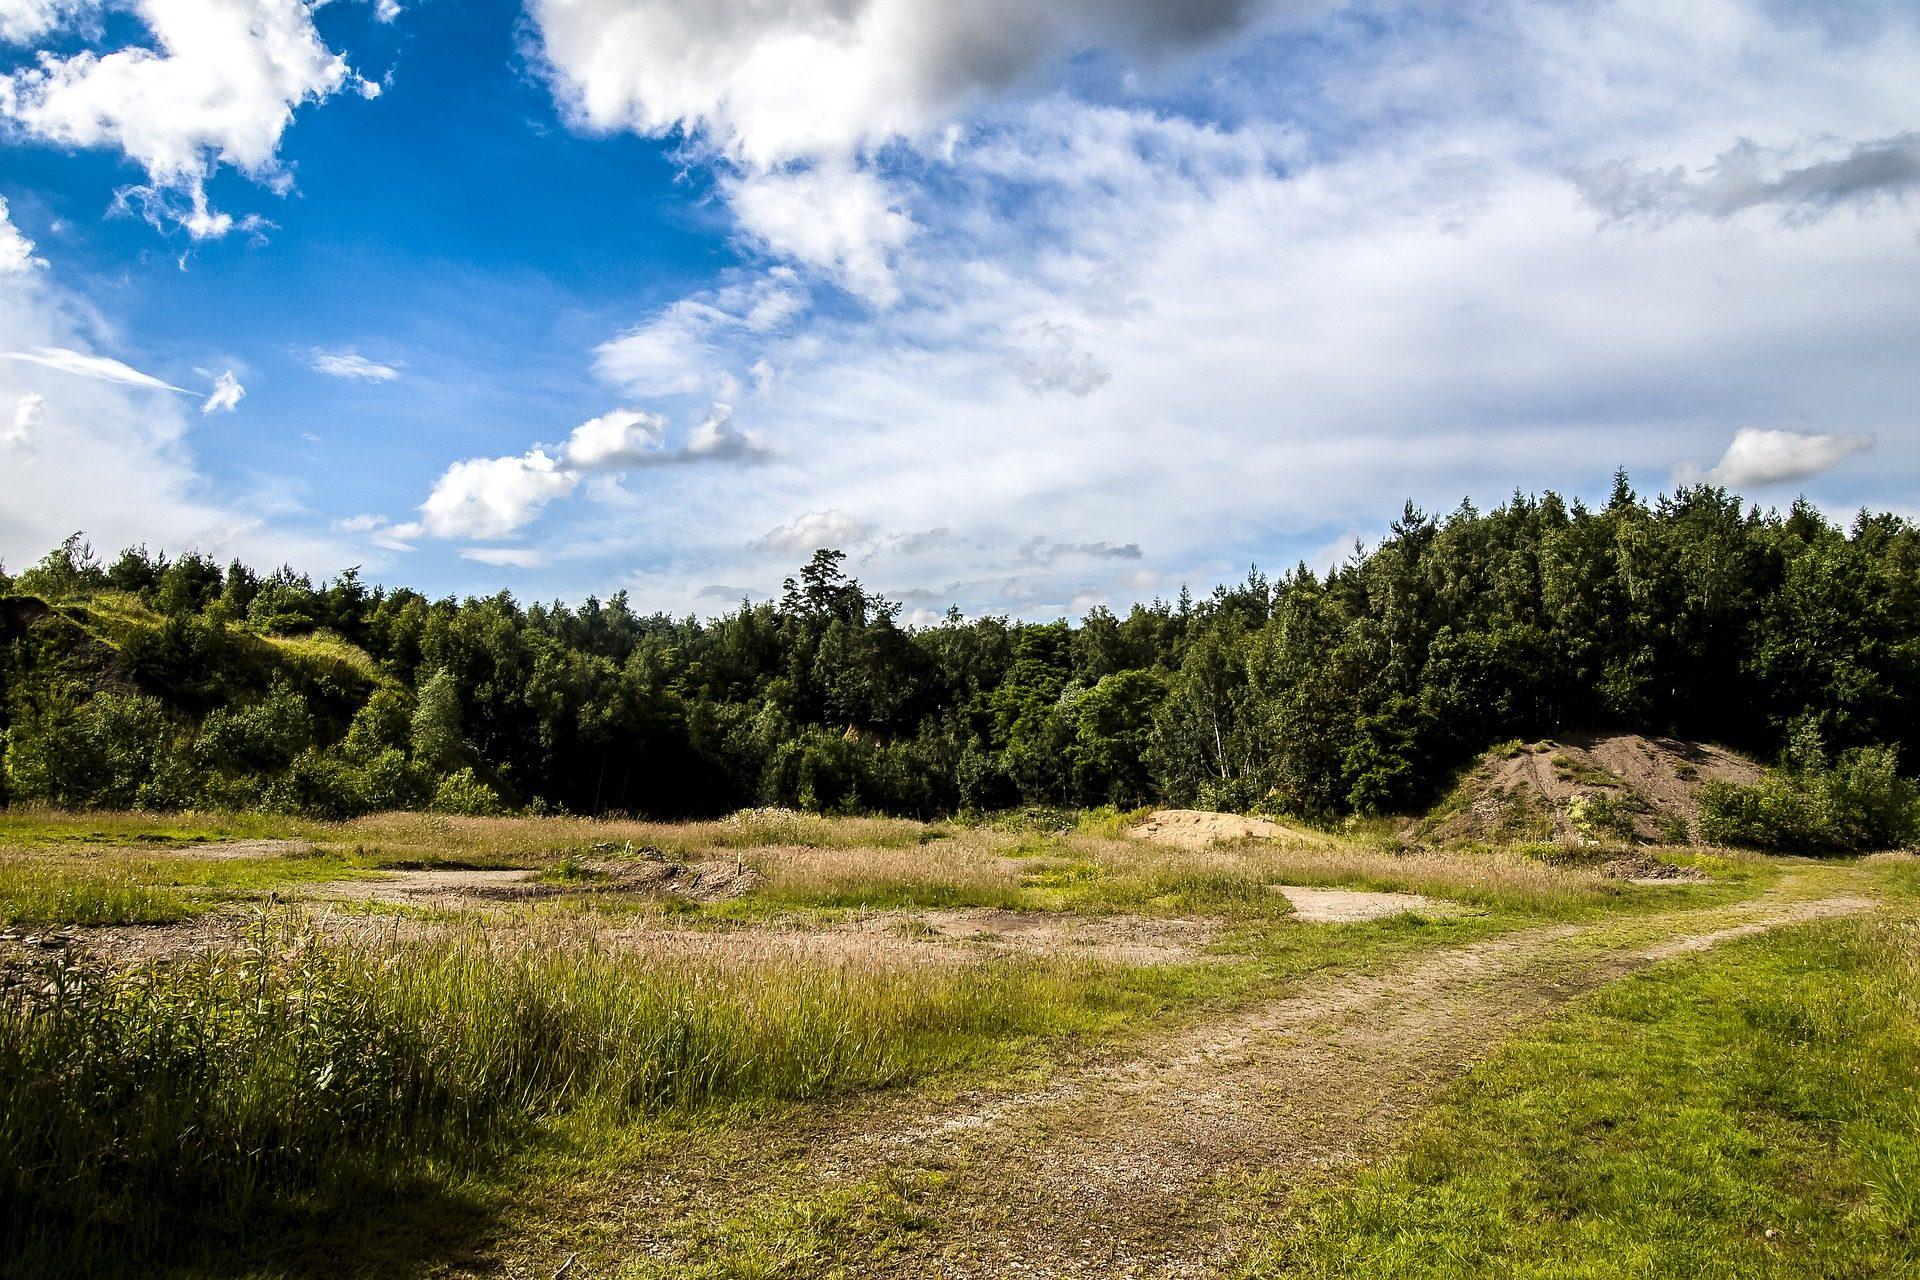 domaine, PRADO, Forest, arbres, pelouse, Sky, nuages - Fonds d'écran HD - Professor-falken.com